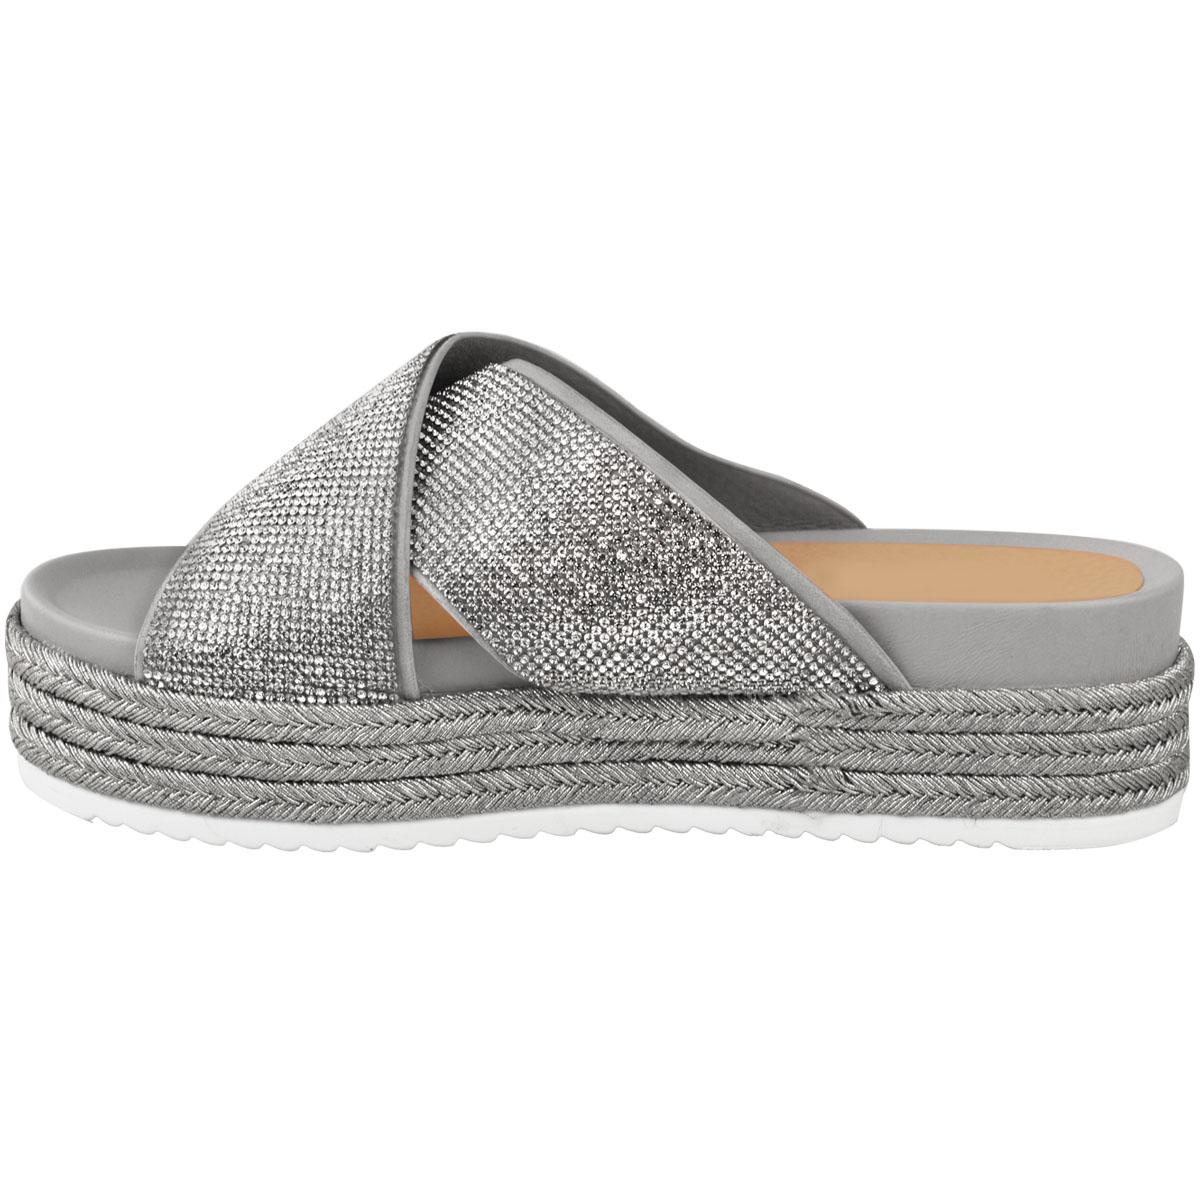 Womens-Ladies-Diamante-Slip-On-Sandals-Flatforms-Sparkly-Platform-Summer-Size-UK thumbnail 15